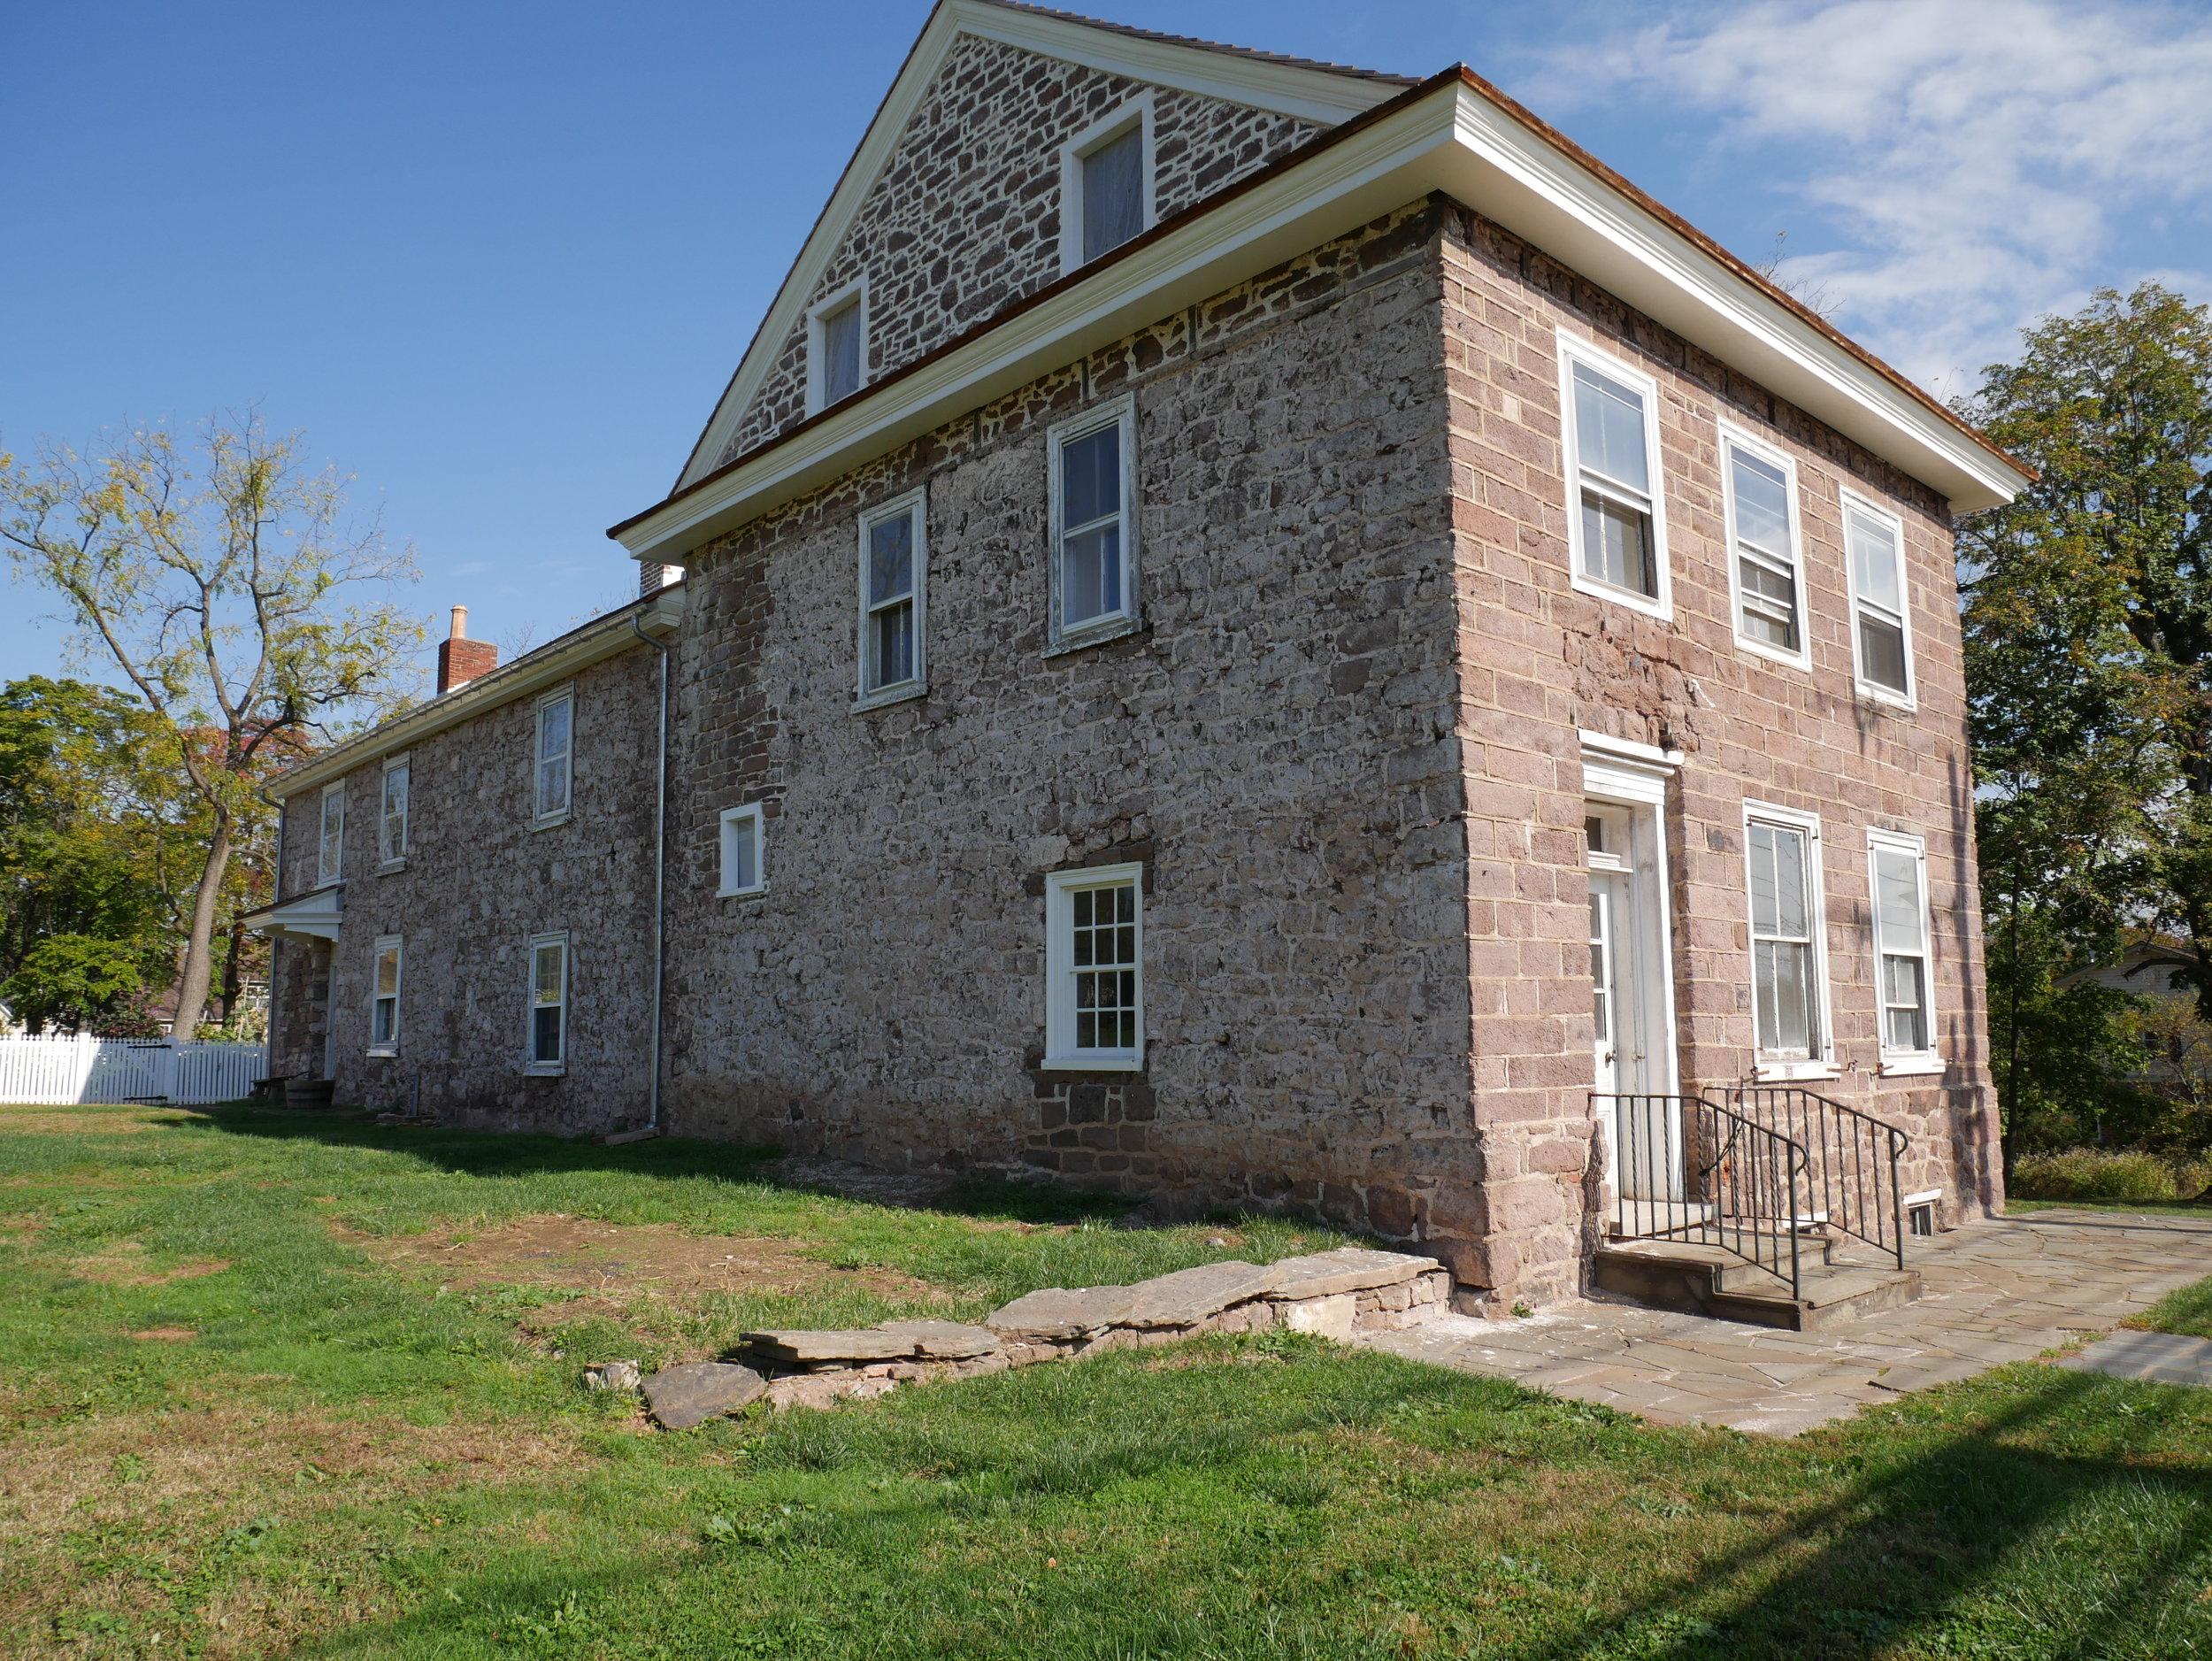 Speakers House